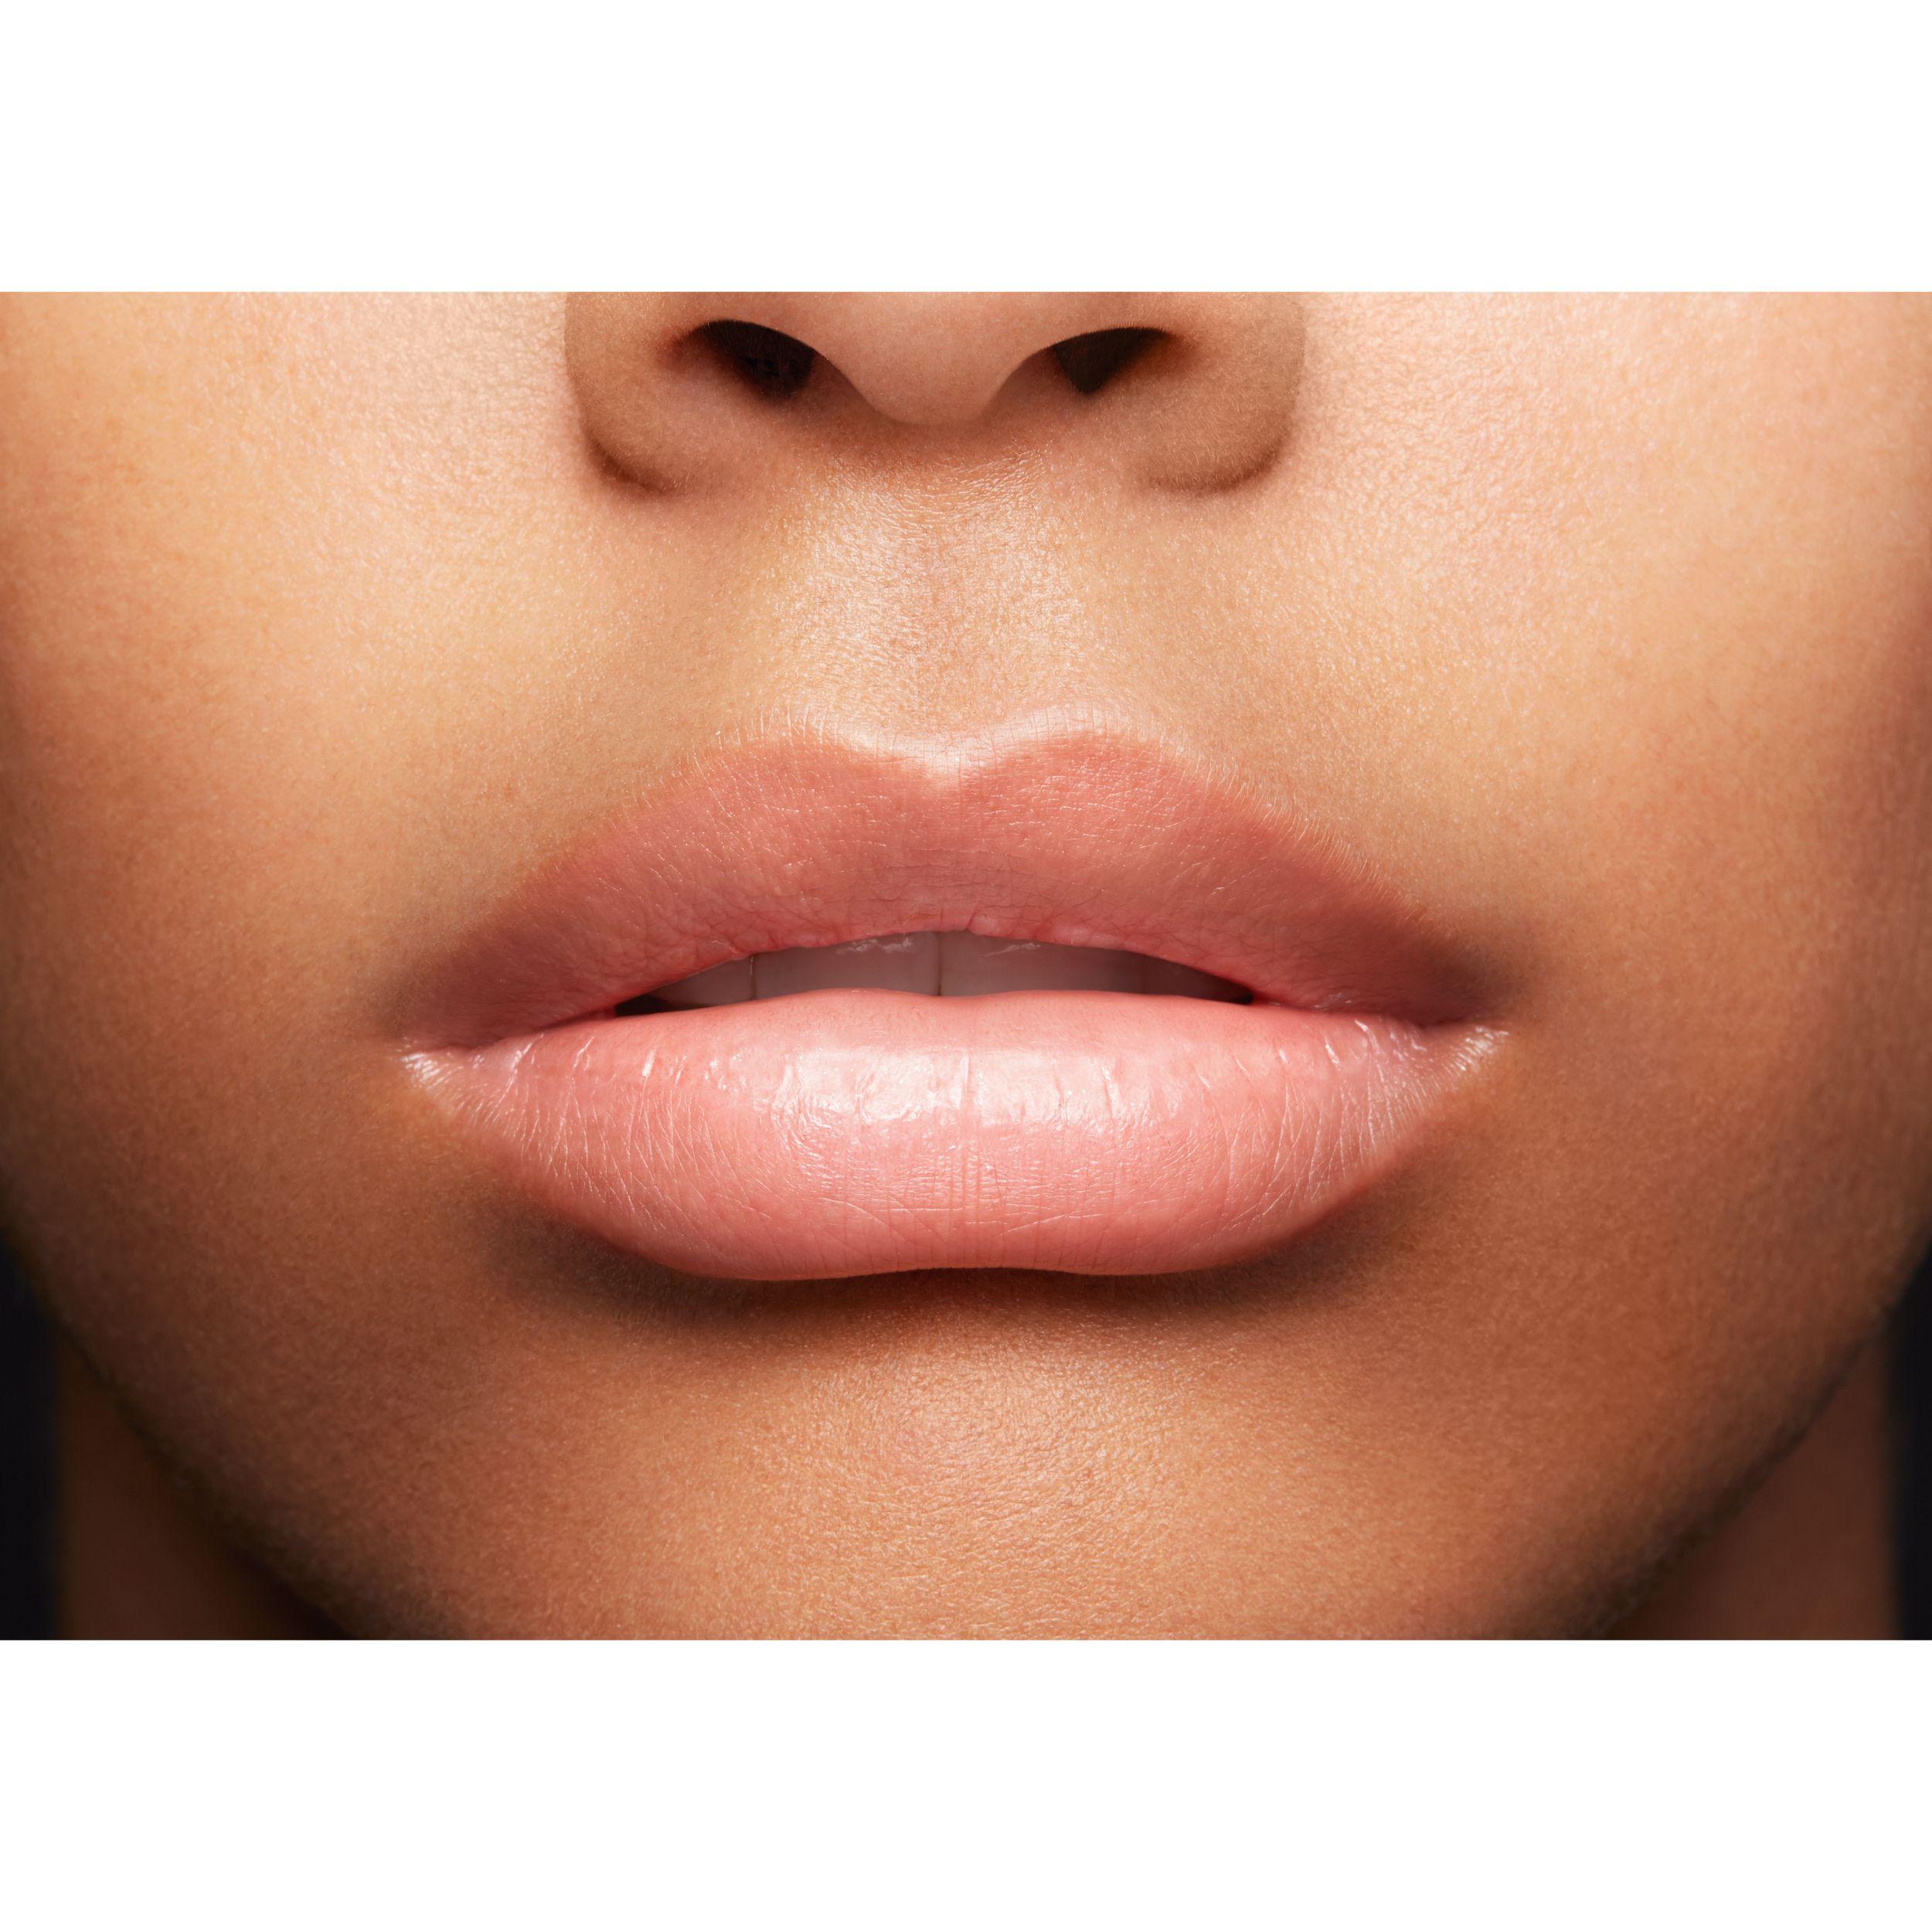 L'Absolu Mademoiselle Shine Lipstick 230 Watch Me Shine